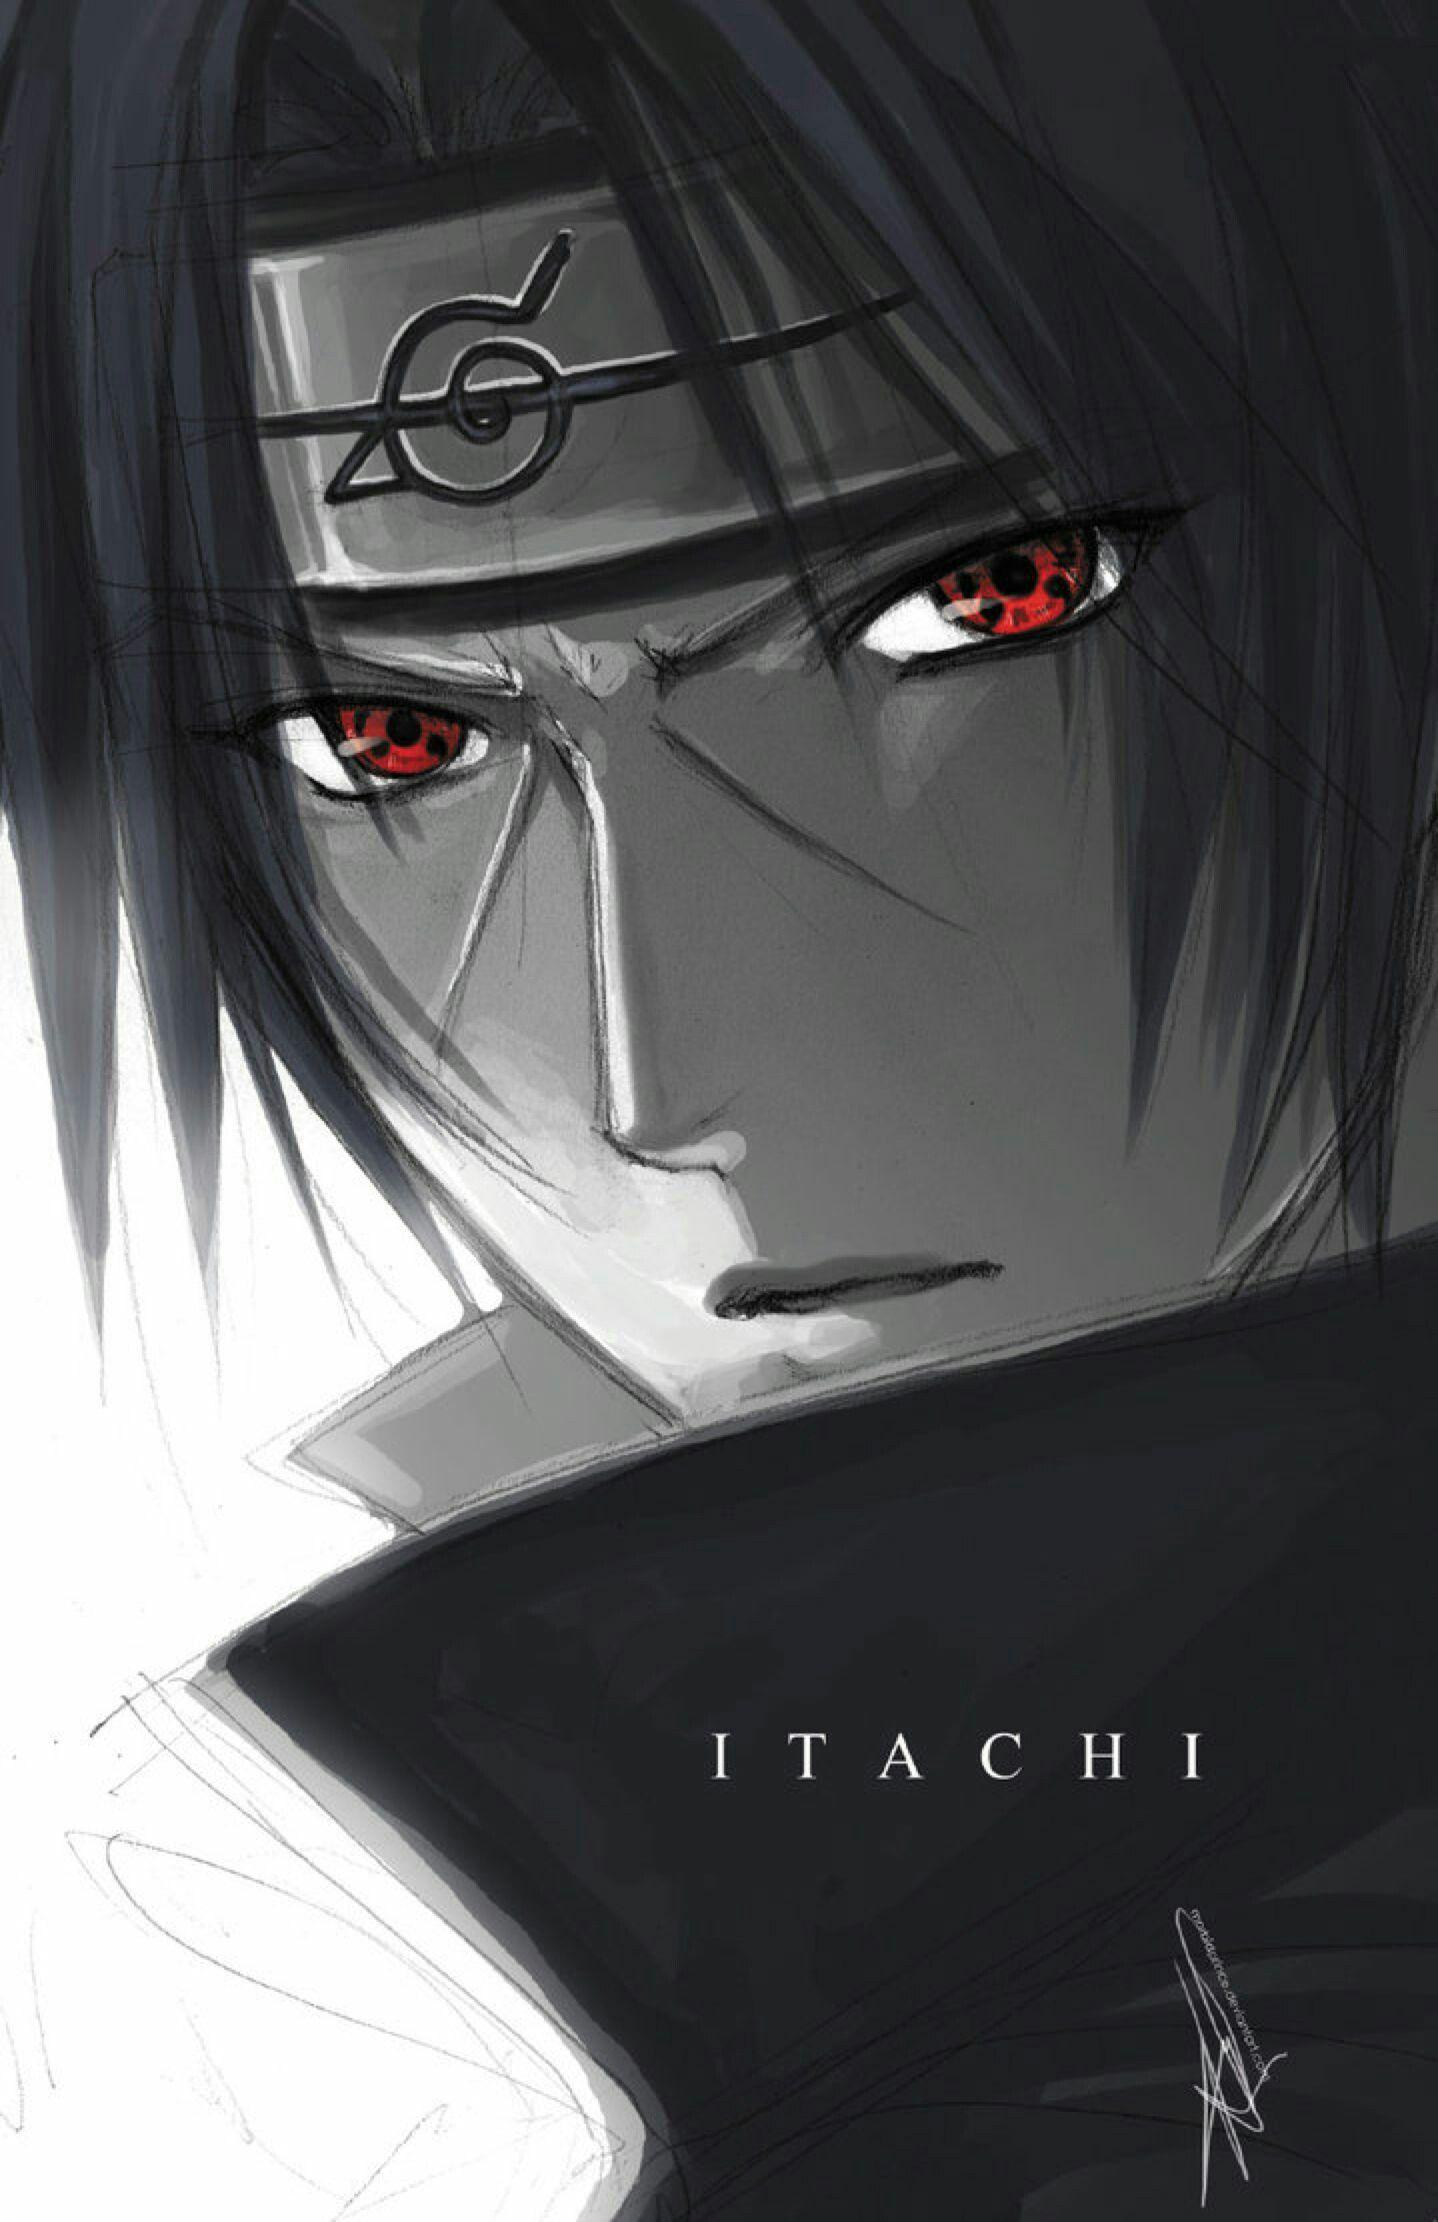 itachi イタチ アニメの壁紙 イタチ naruto